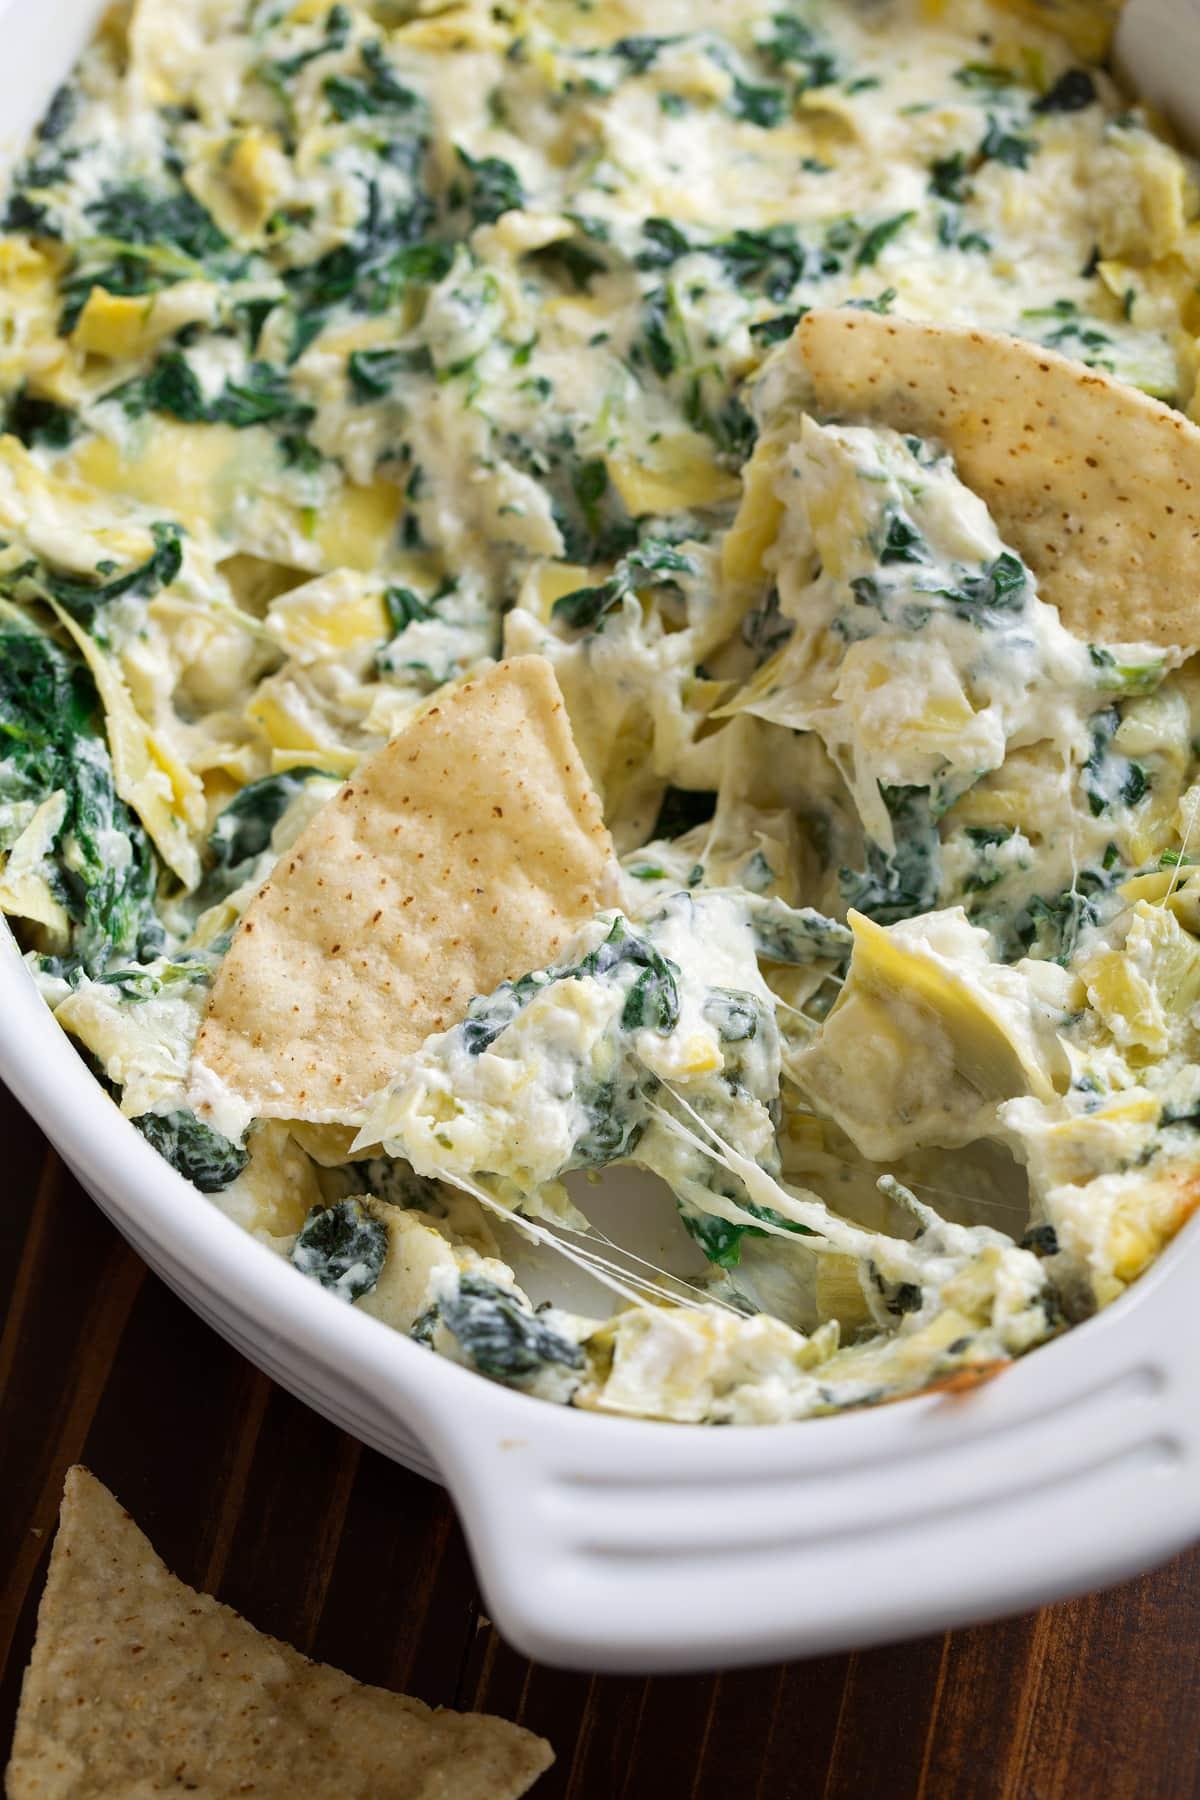 Spinach Artichoke Dip in baking dish.